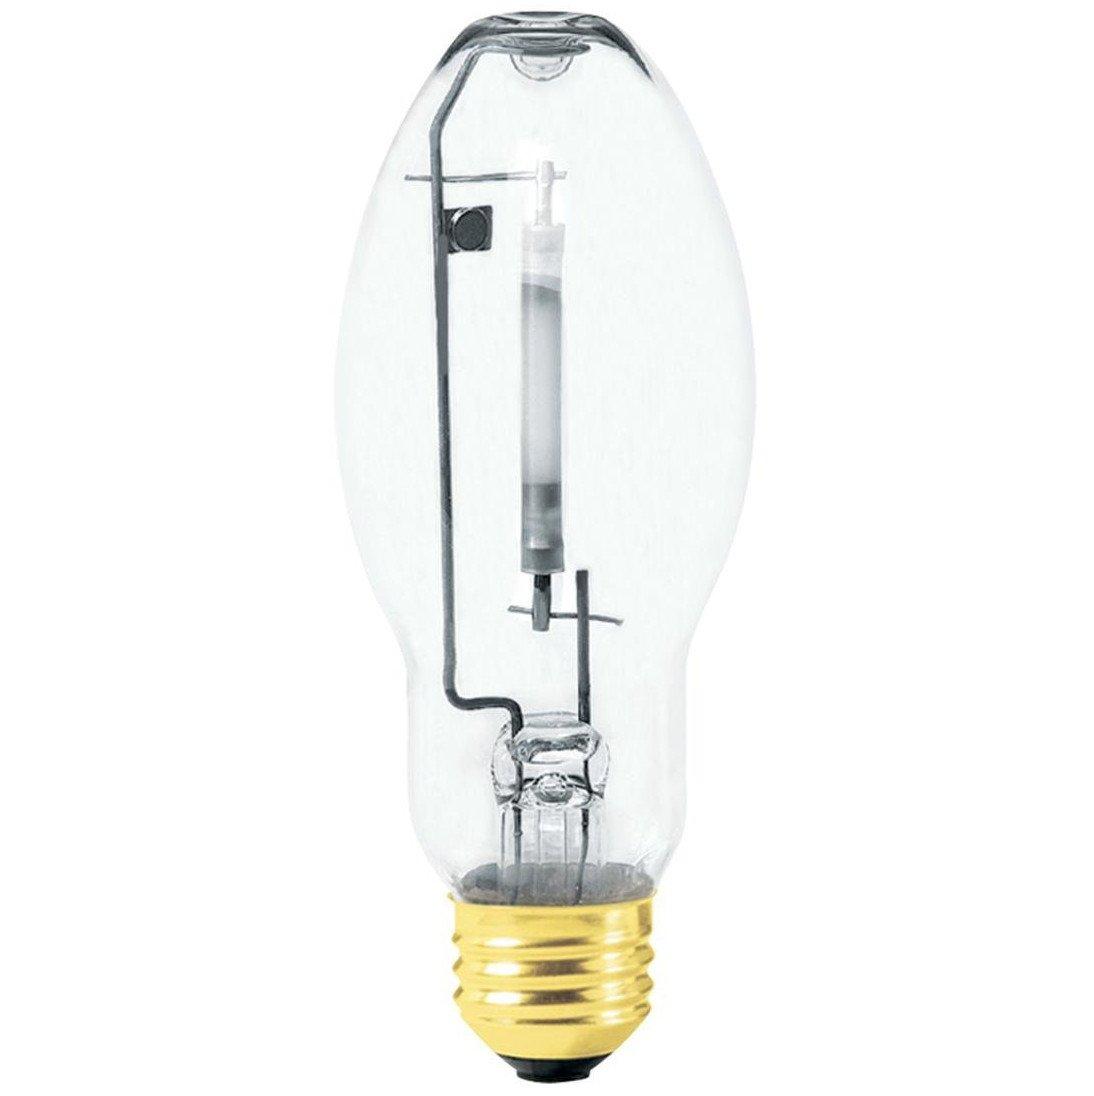 Philips 30347-9 (2-Pack) C150S55/M 150-Watt High Pressure Sodium HID Light Bulb, 2100K, 16500 Lumens, E26 Base